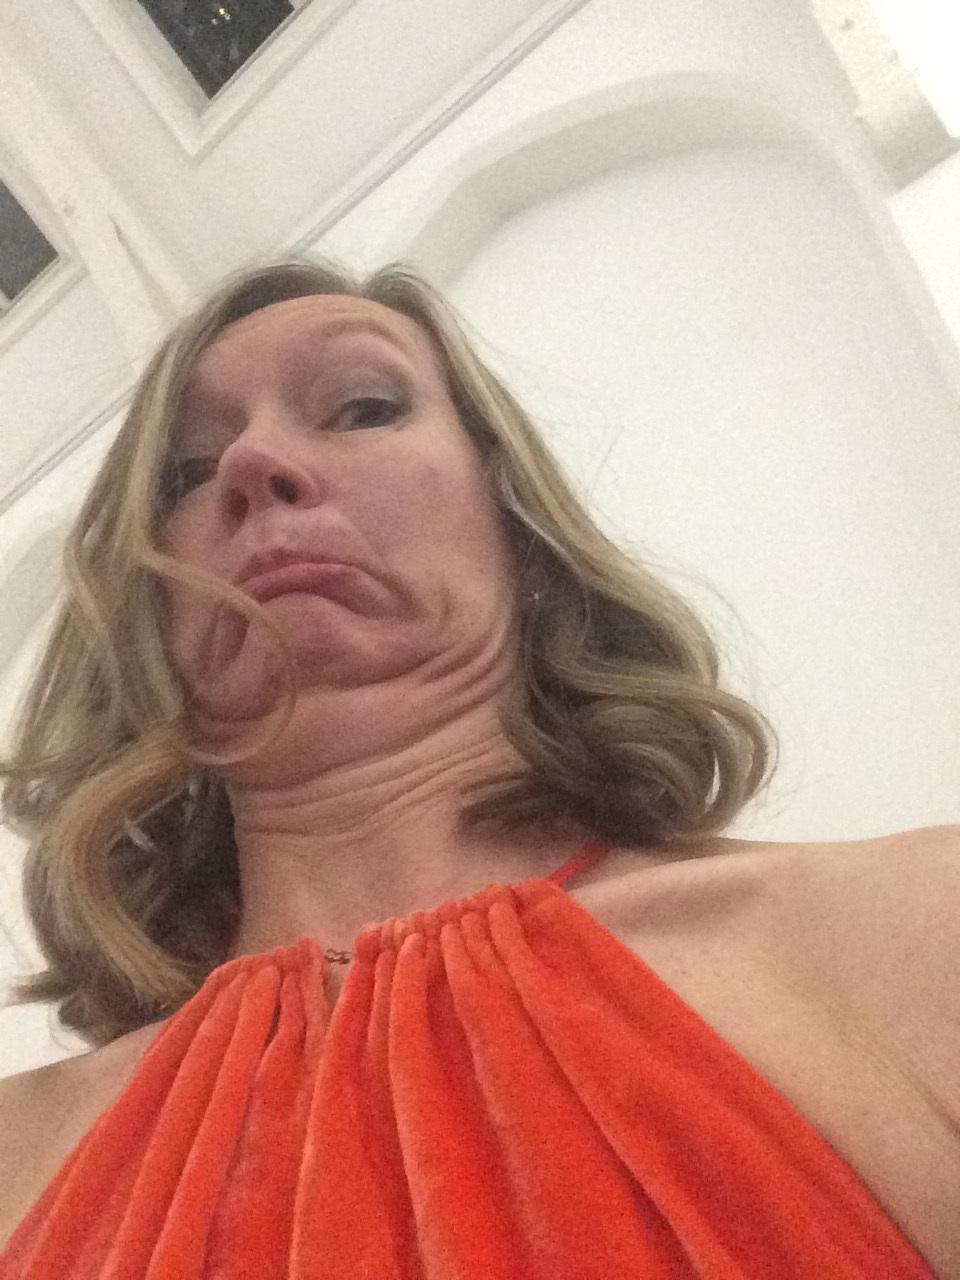 Ugly selfies pics